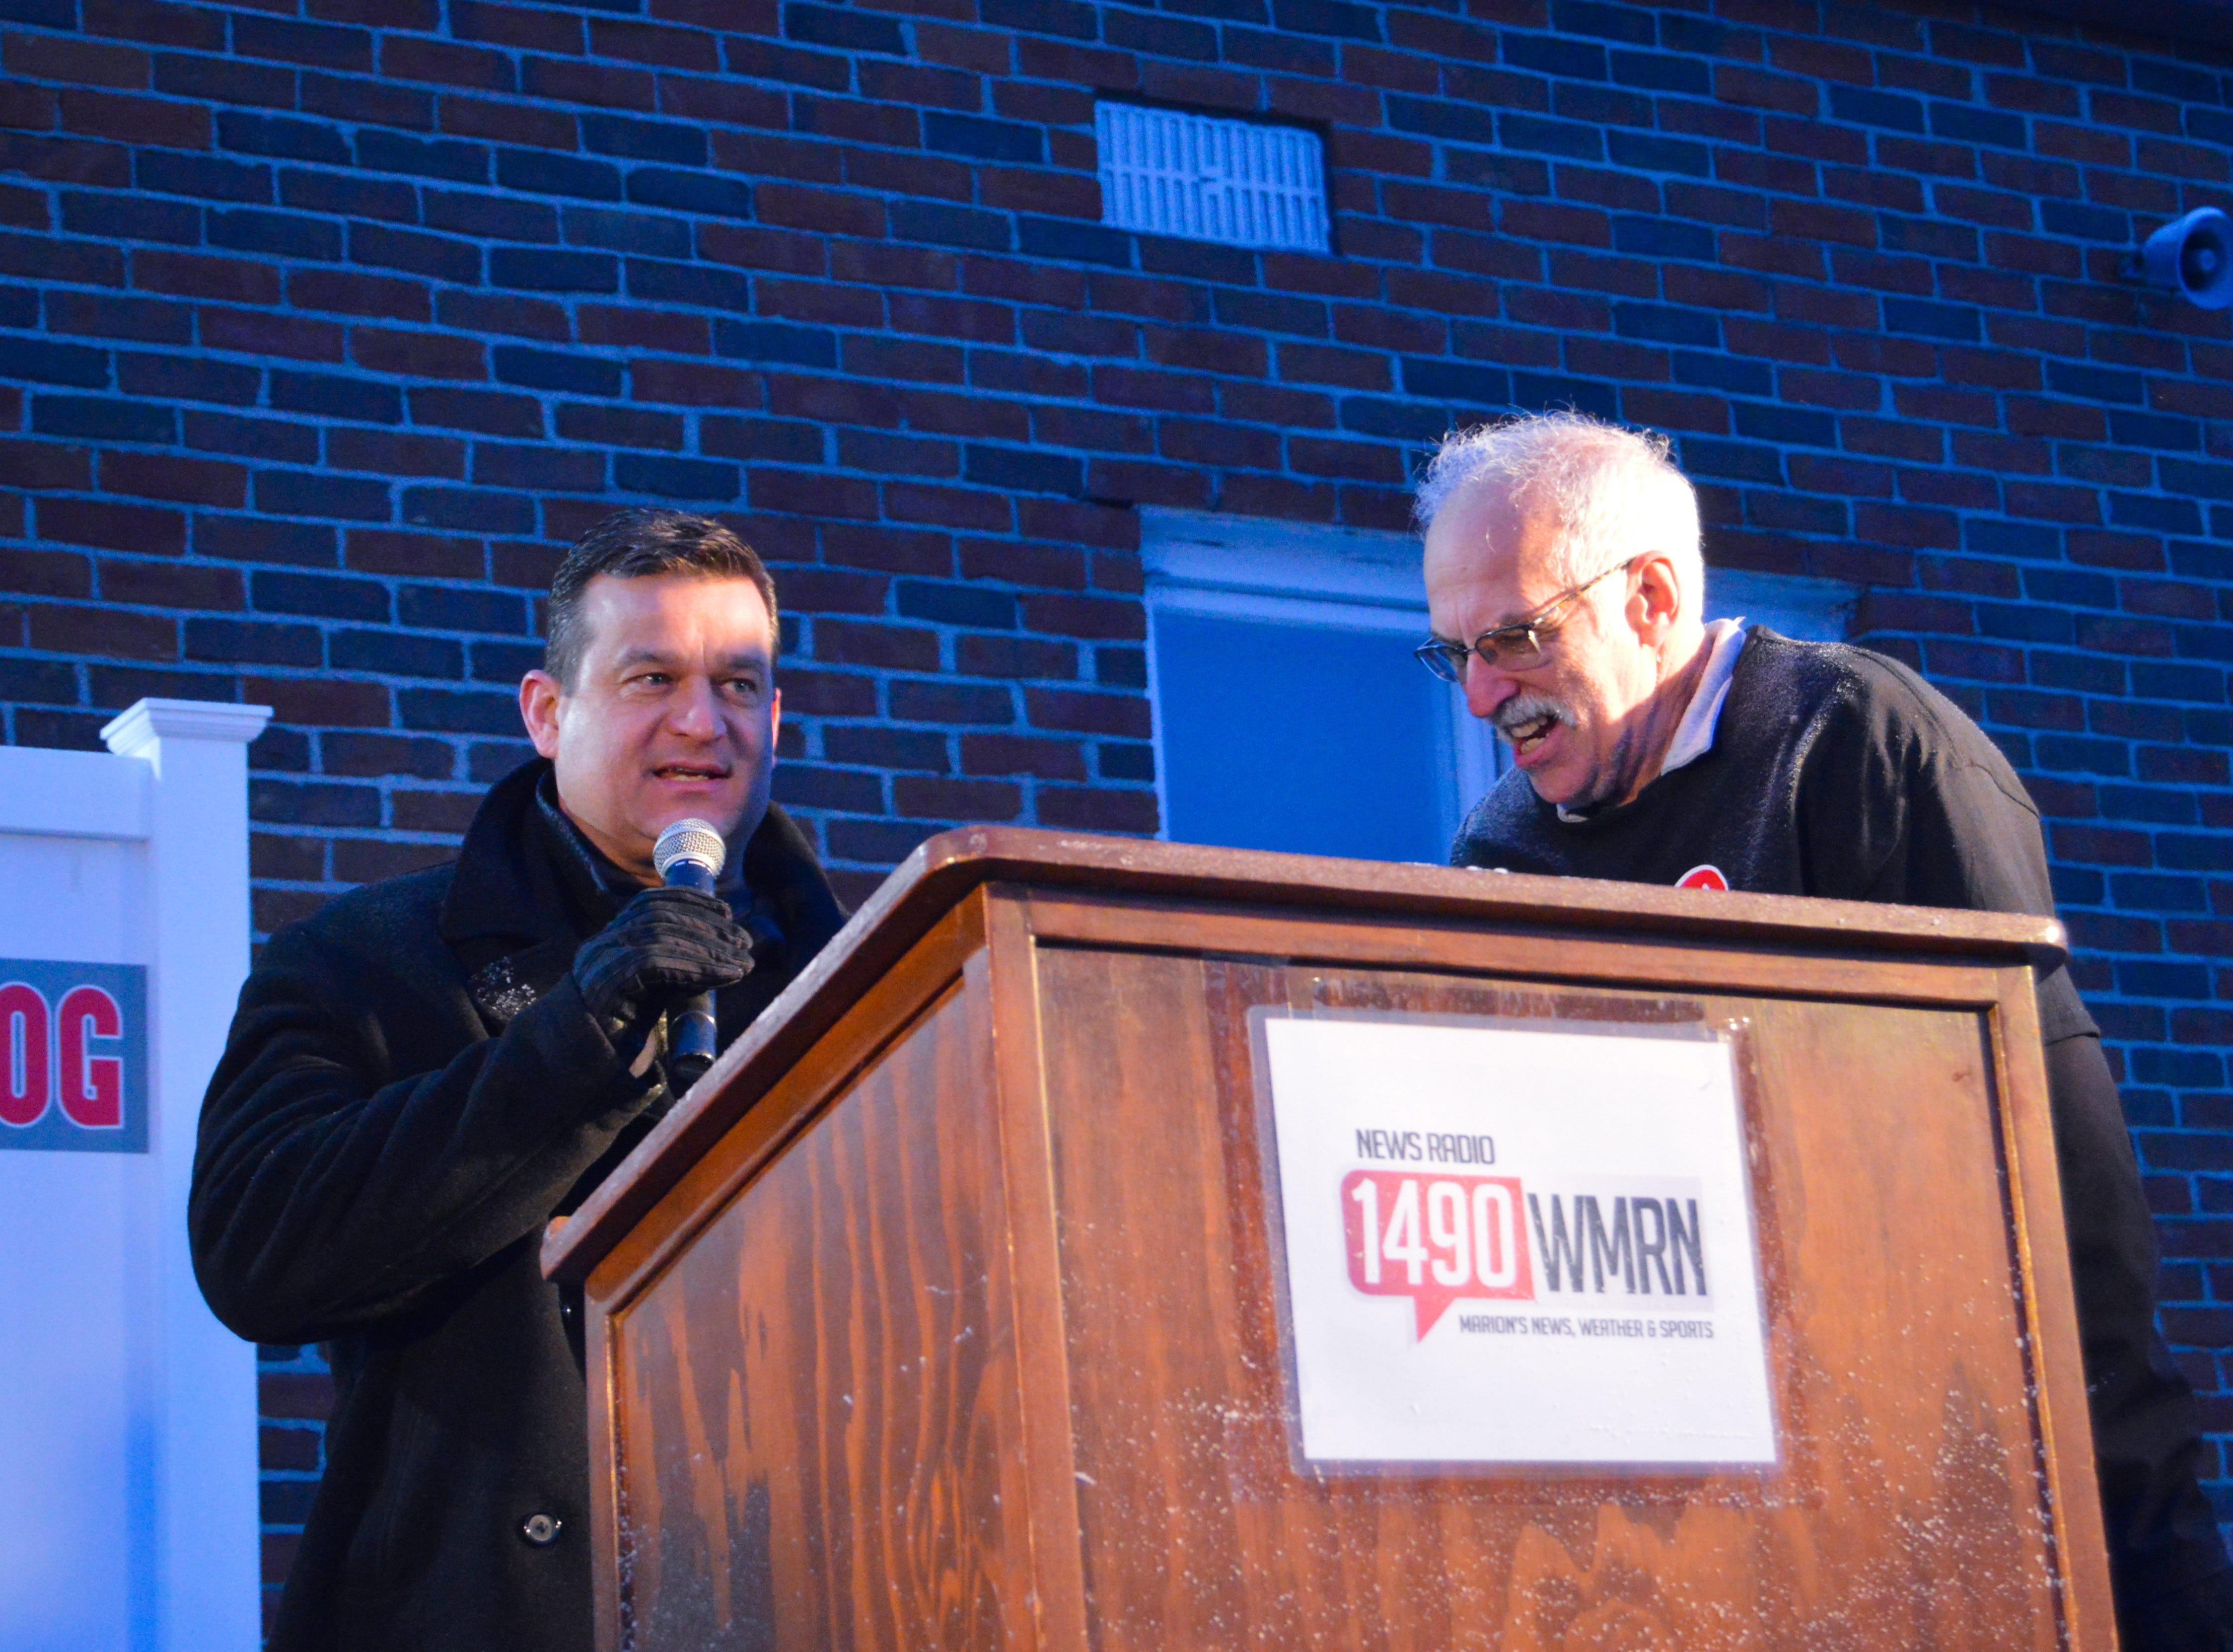 Marion Mayor Scott Schertzer, left, and WMRN's Jeff Ruth at Buckeye Chuck's 2019 spring prognostication.